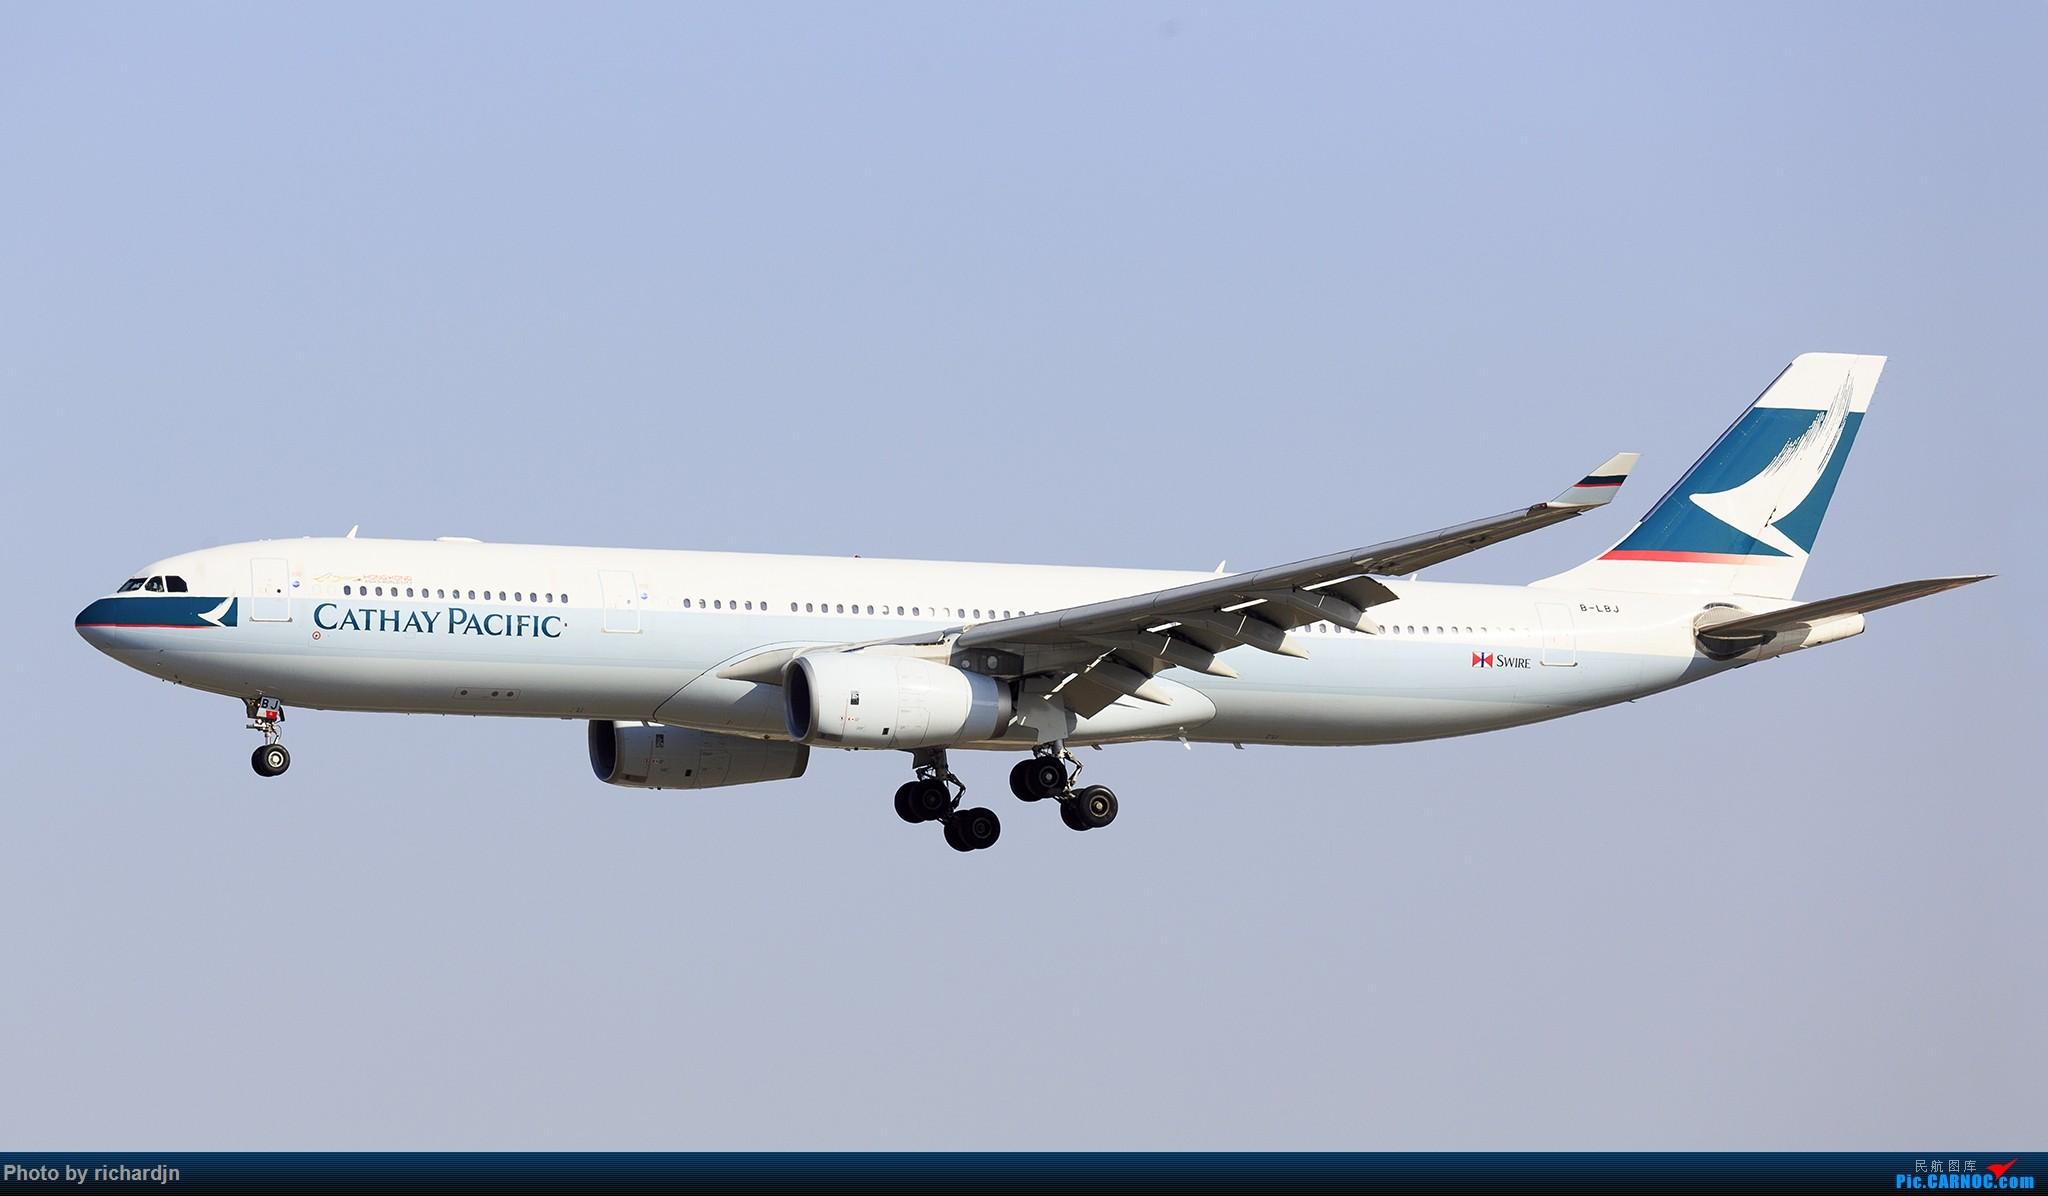 Re:[原创]新年第一撸~哈哈 AIRBUS A330-300 B-LBJ 中国北京首都国际机场